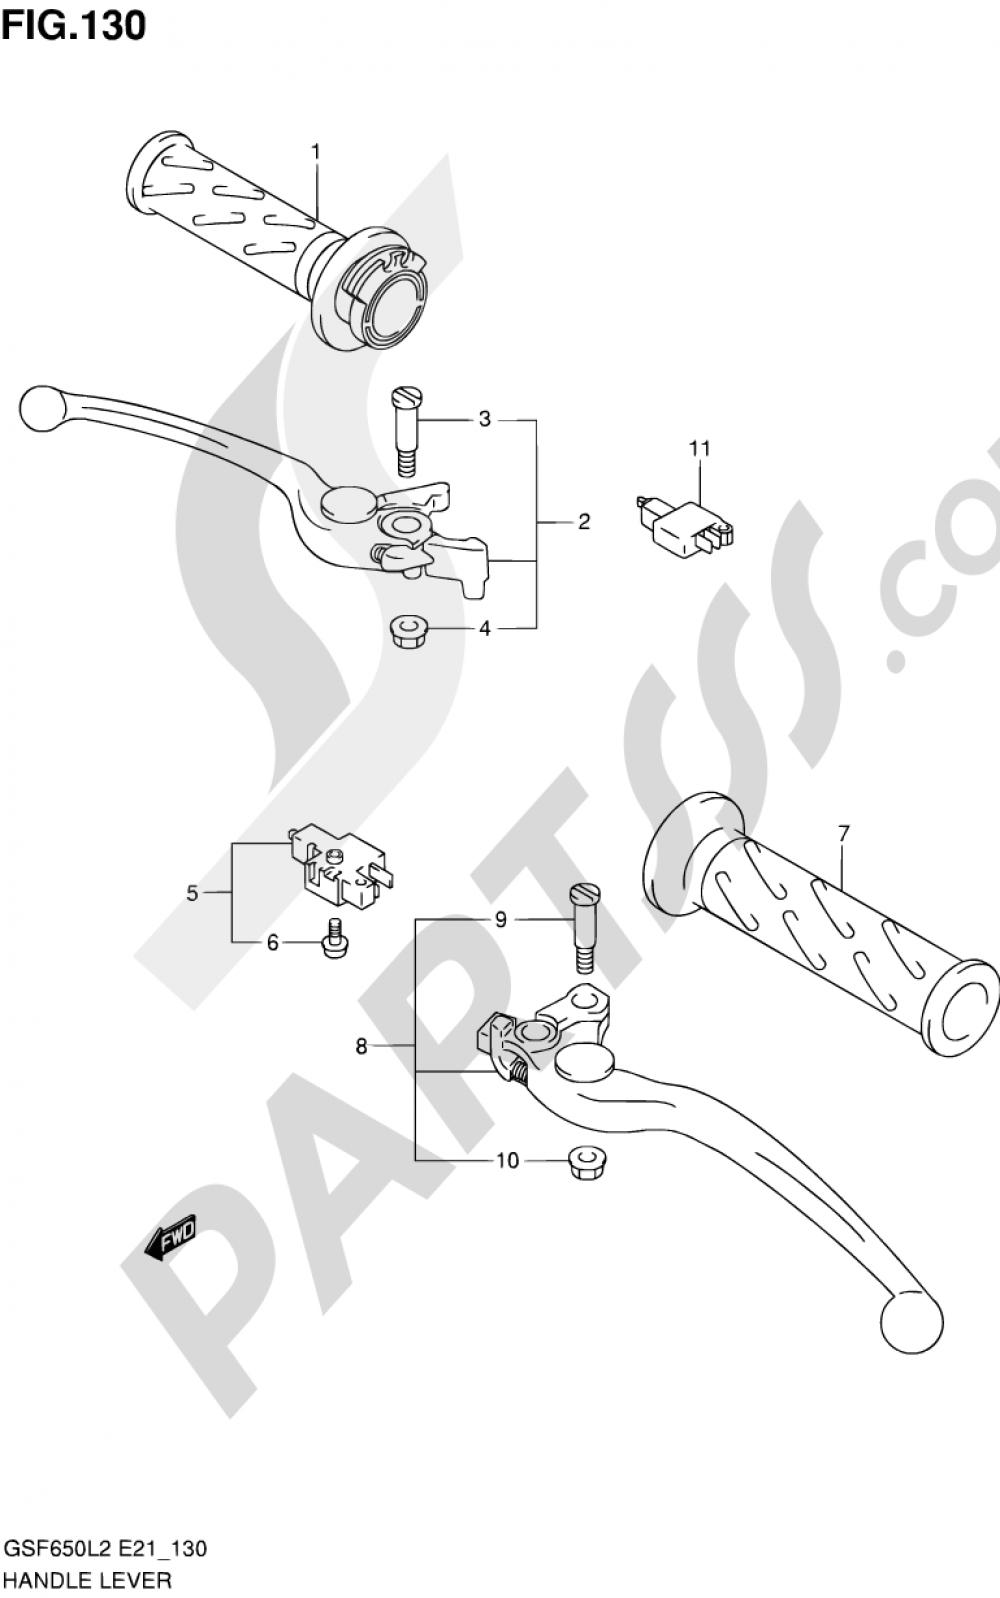 130 - HANDLE LEVER (GSF650UAL2 E21) Suzuki BANDIT GSF650 2012